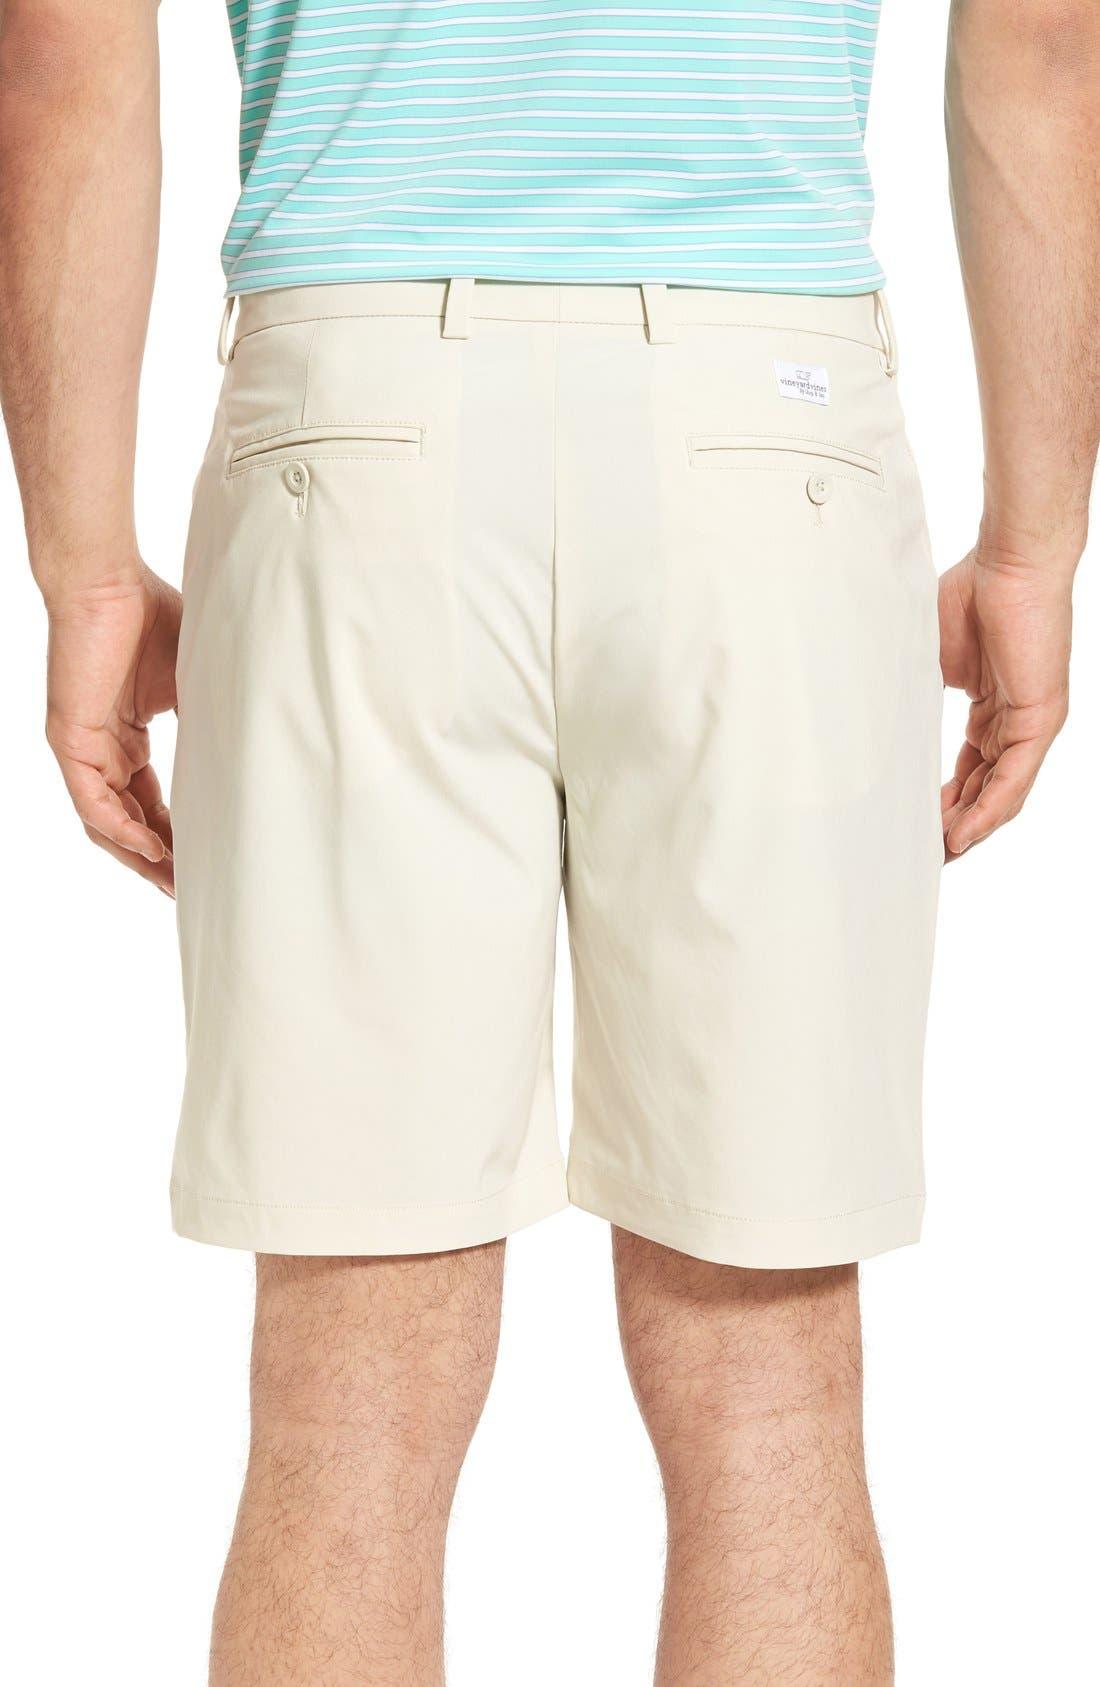 8 Inch Performance Breaker Shorts,                             Alternate thumbnail 34, color,